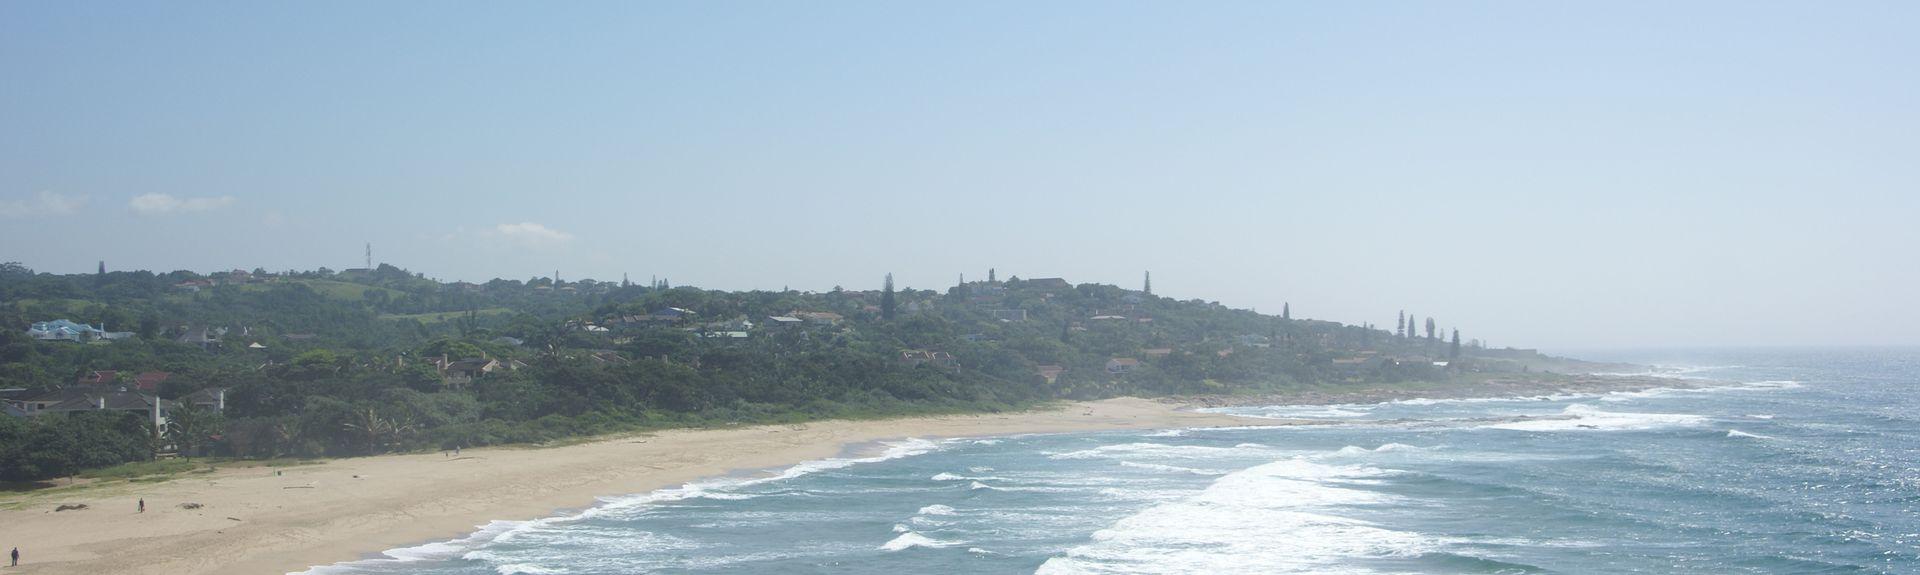 Margate, KwaZulu-Natal (province), South Africa